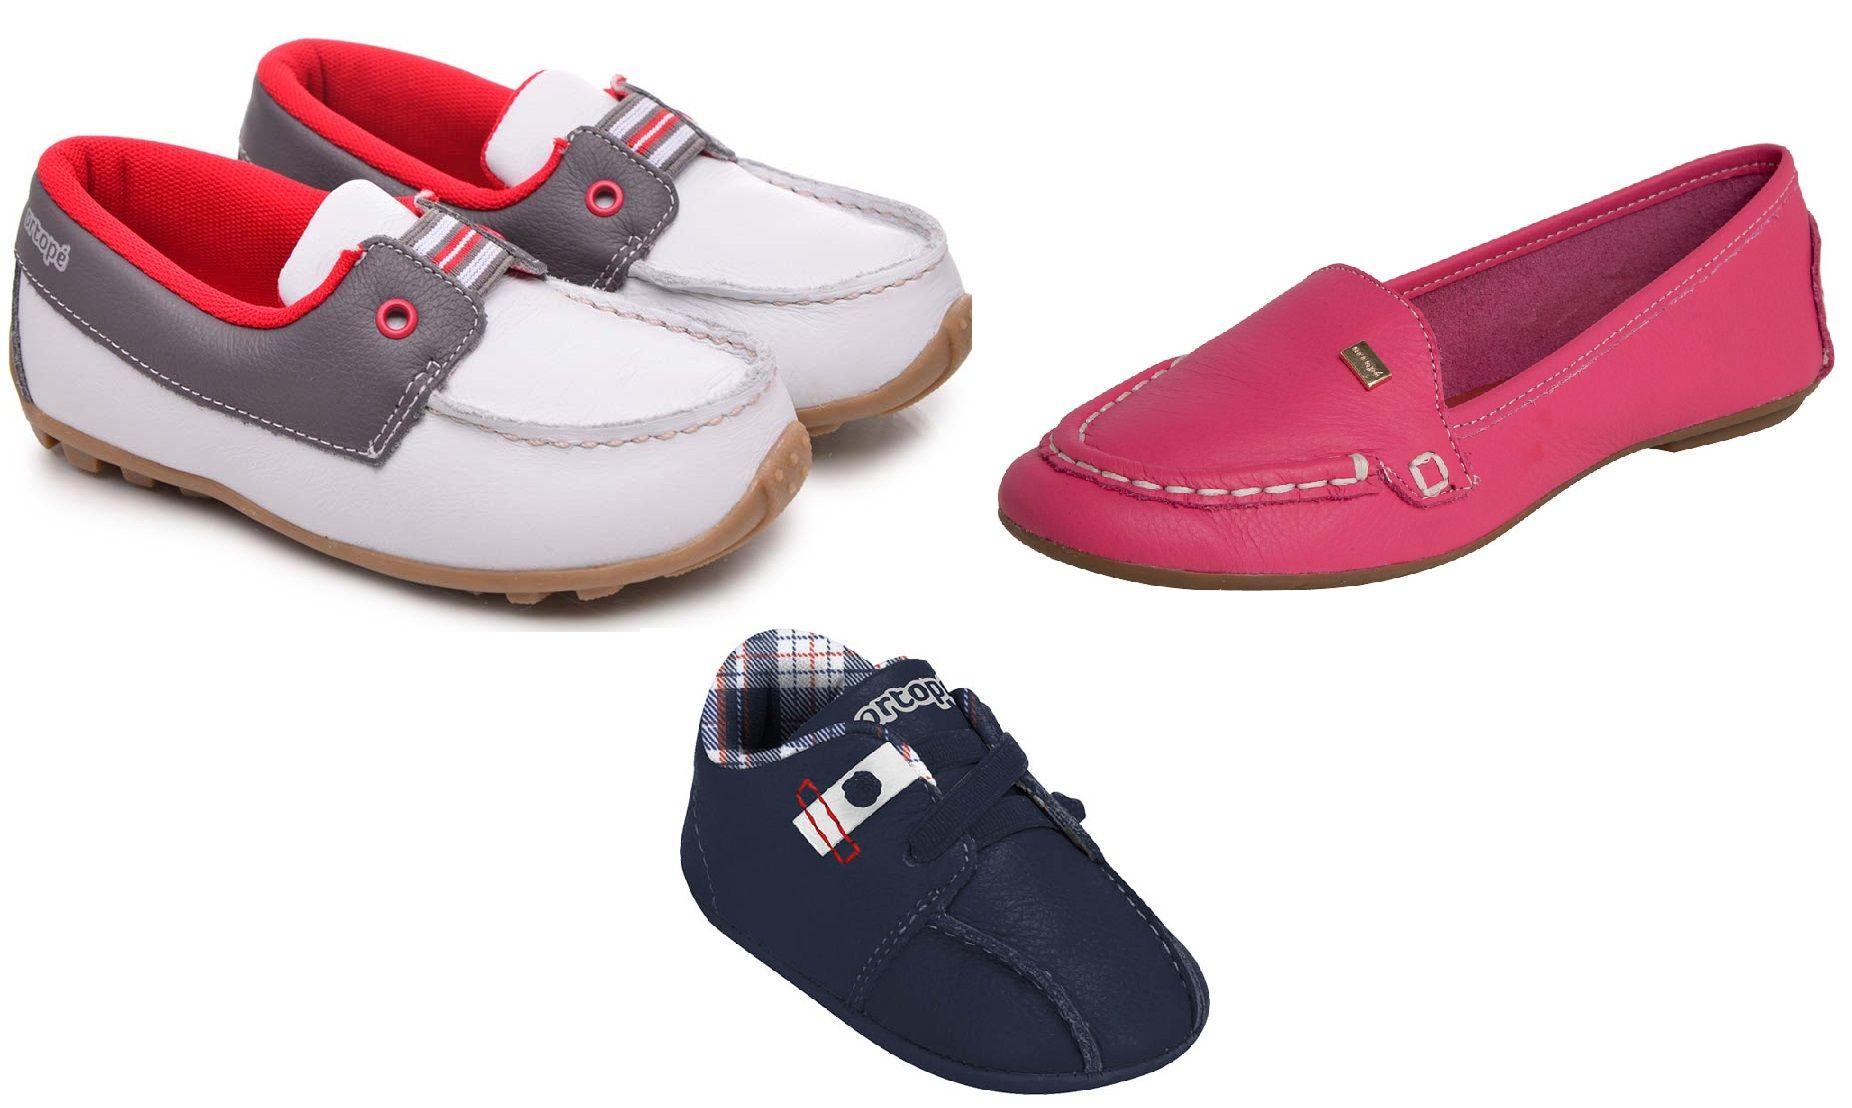 767c5675c sapatos-ortopé-rosa-menino-menina-infantil-mocassim-ortopédico ...